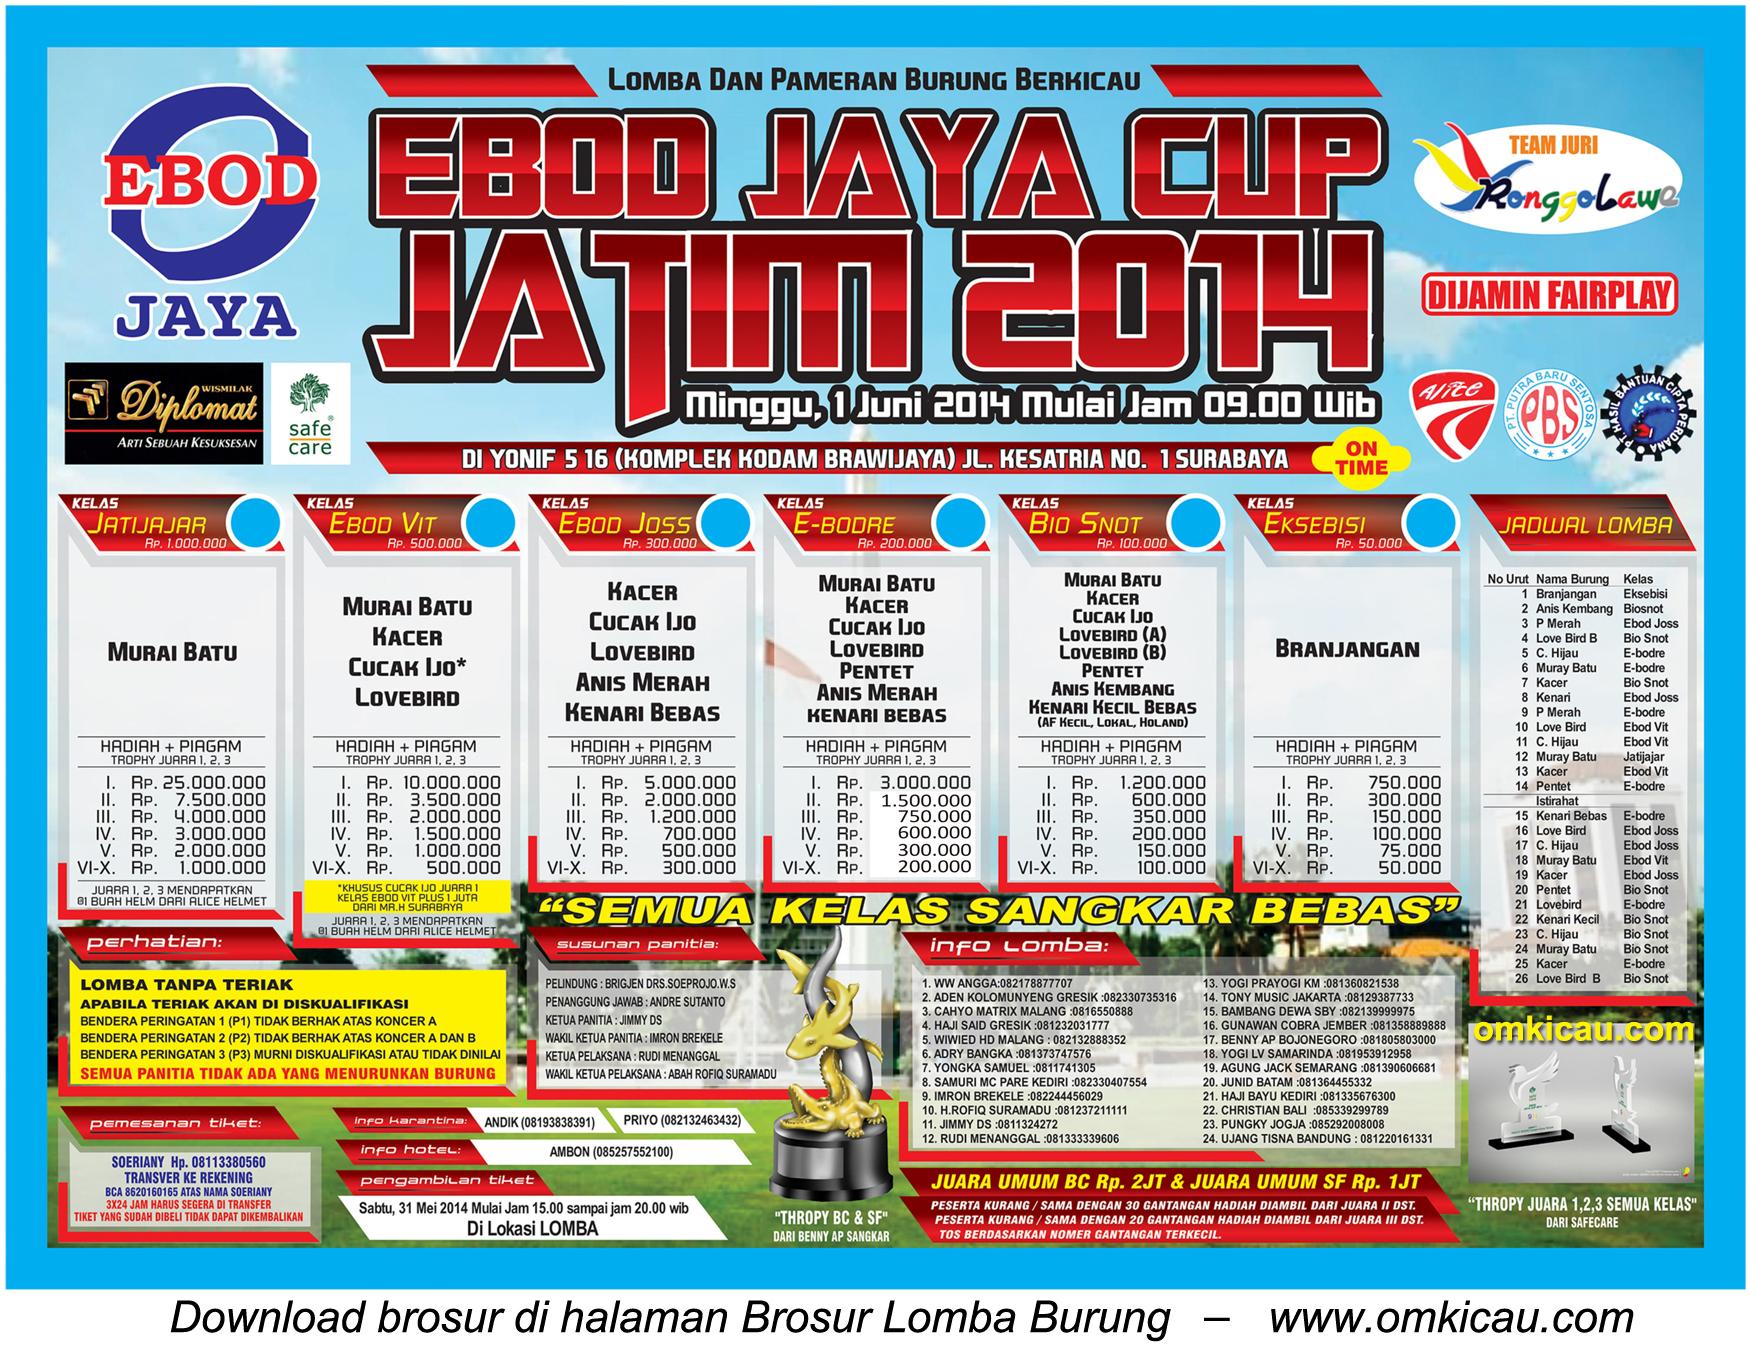 Brosur Lomba Burung Berkicau Ebod Jaya Cup Jatim 2014, Surabaya, 1 Juni 2014